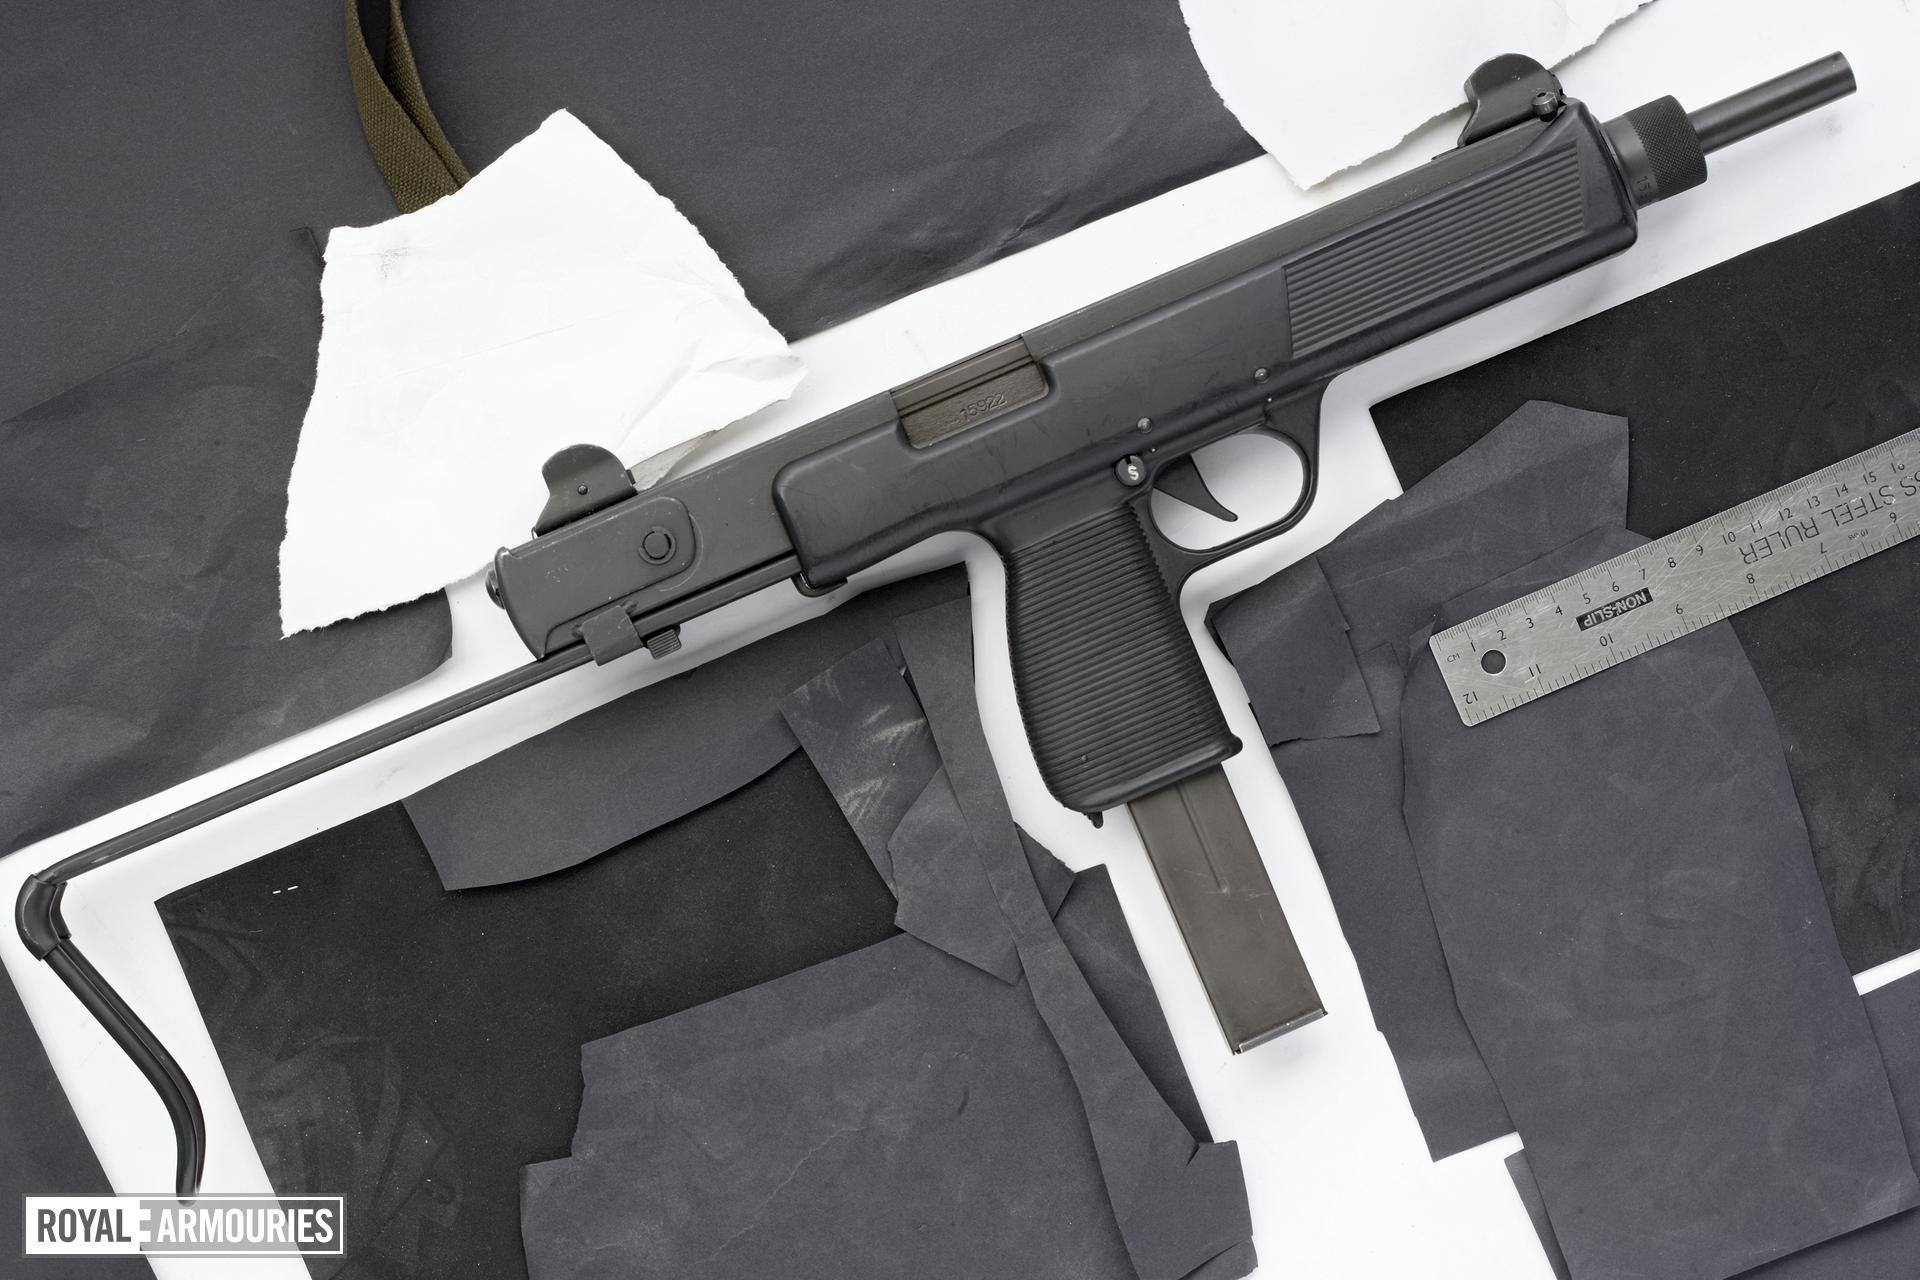 Steyr MPi 69 is a submachine gun that looks like legendary UZI